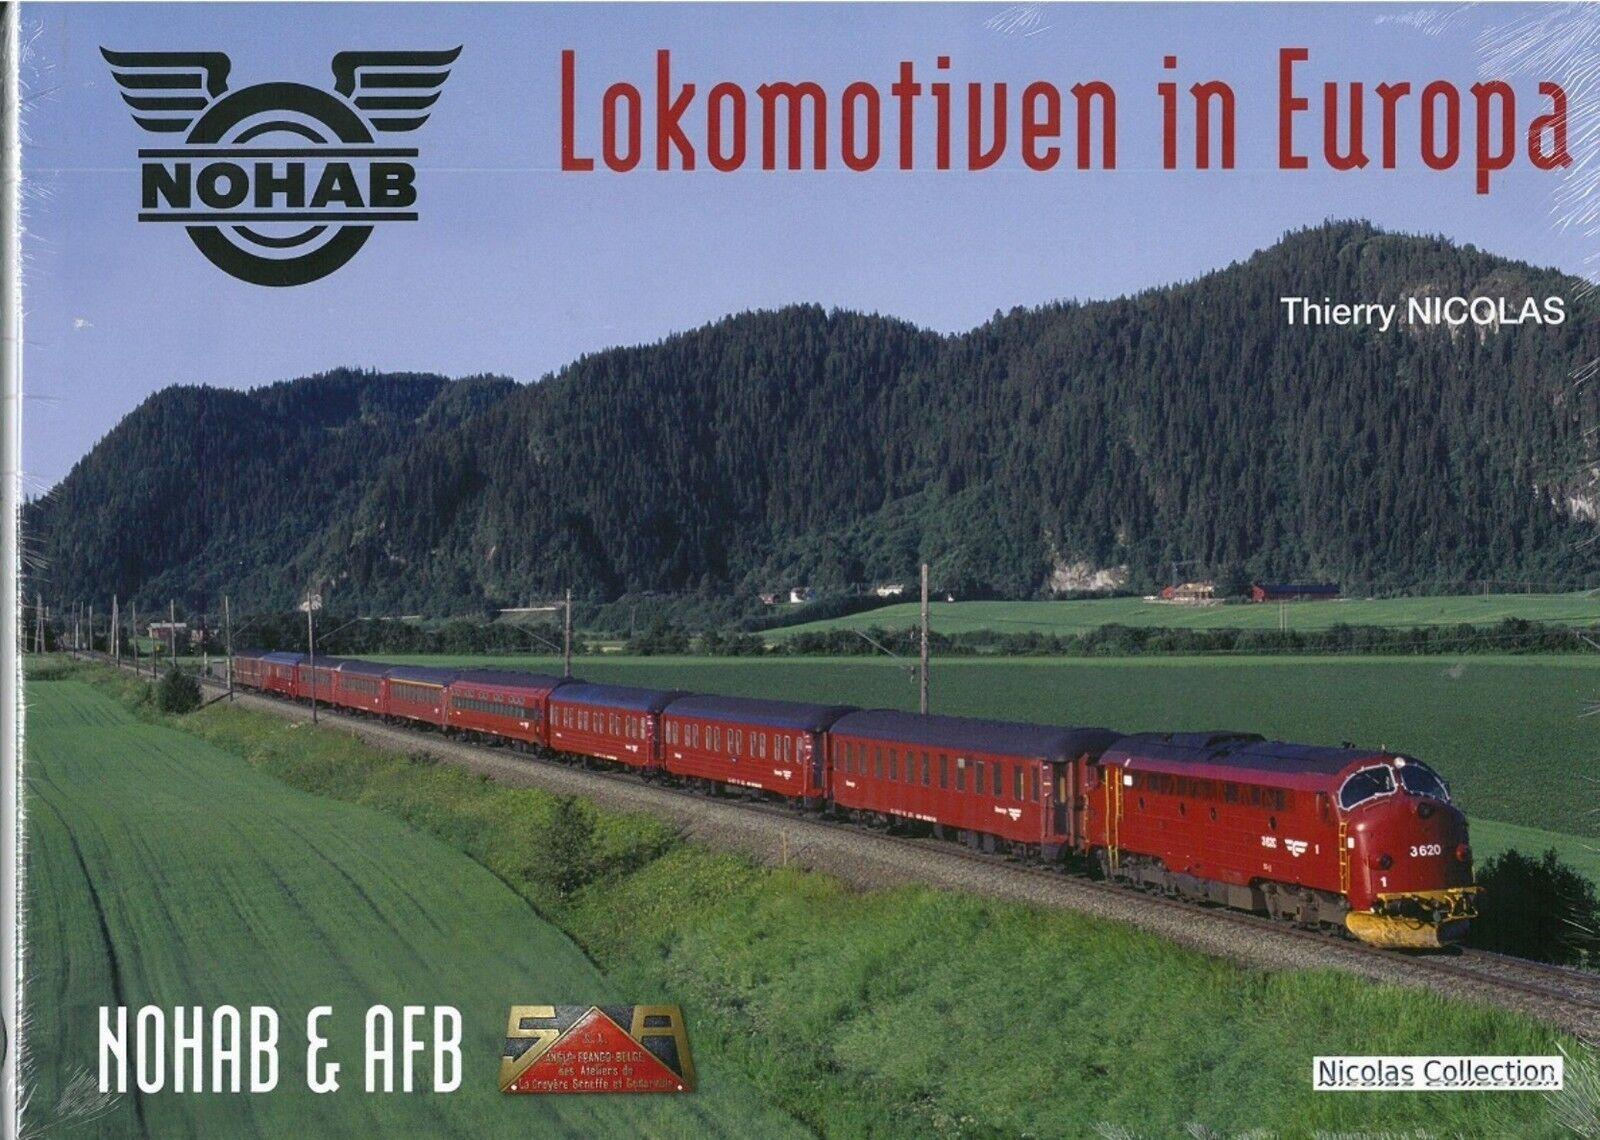 Nicolas Collection 978-2-930748-27-6 Buch NOHAB Lokomotiven in Europa Neu+OVP